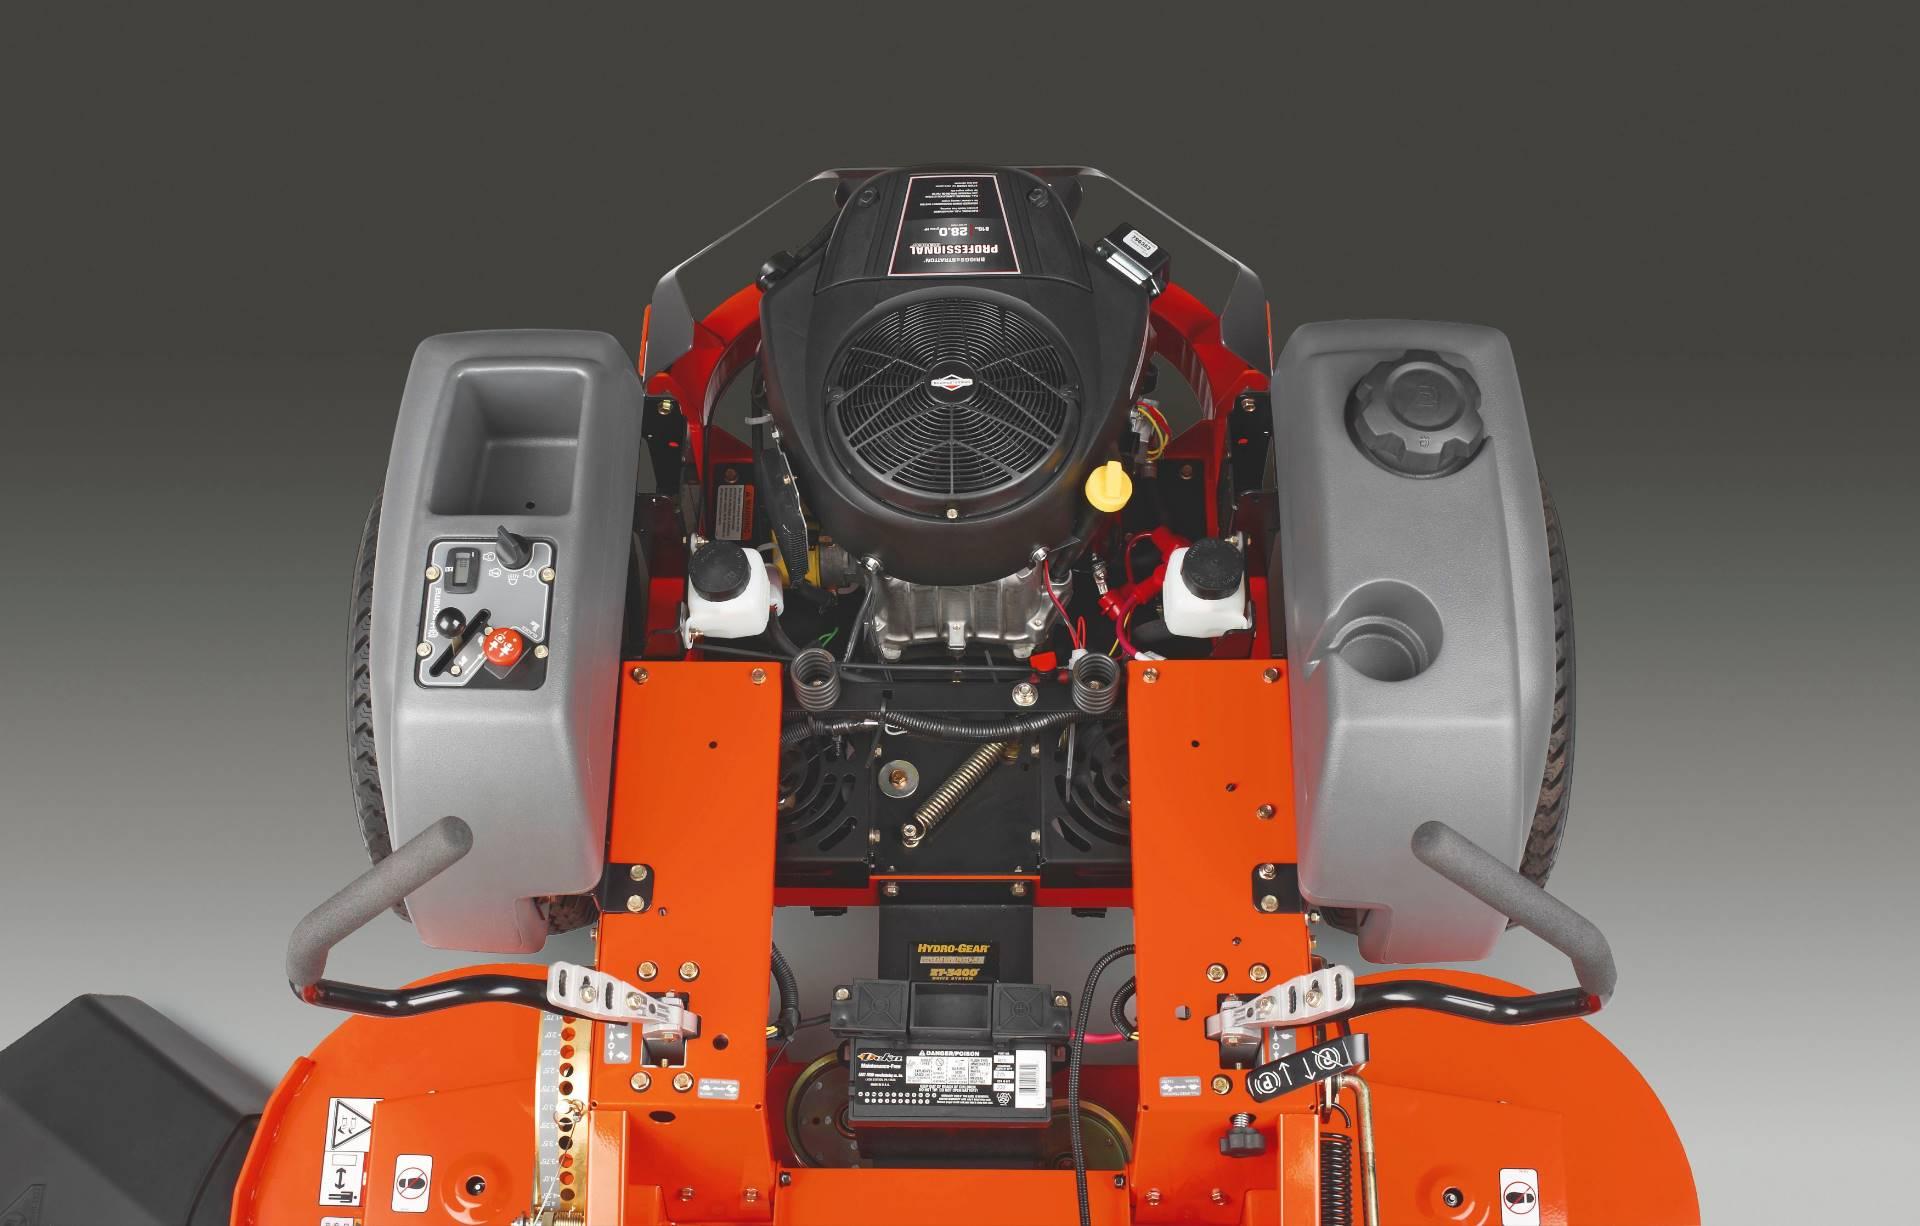 2018 Husqvarna Power Equipment MZ61 Zero-Turn Mower Kawasaki in Talladega,  Alabama